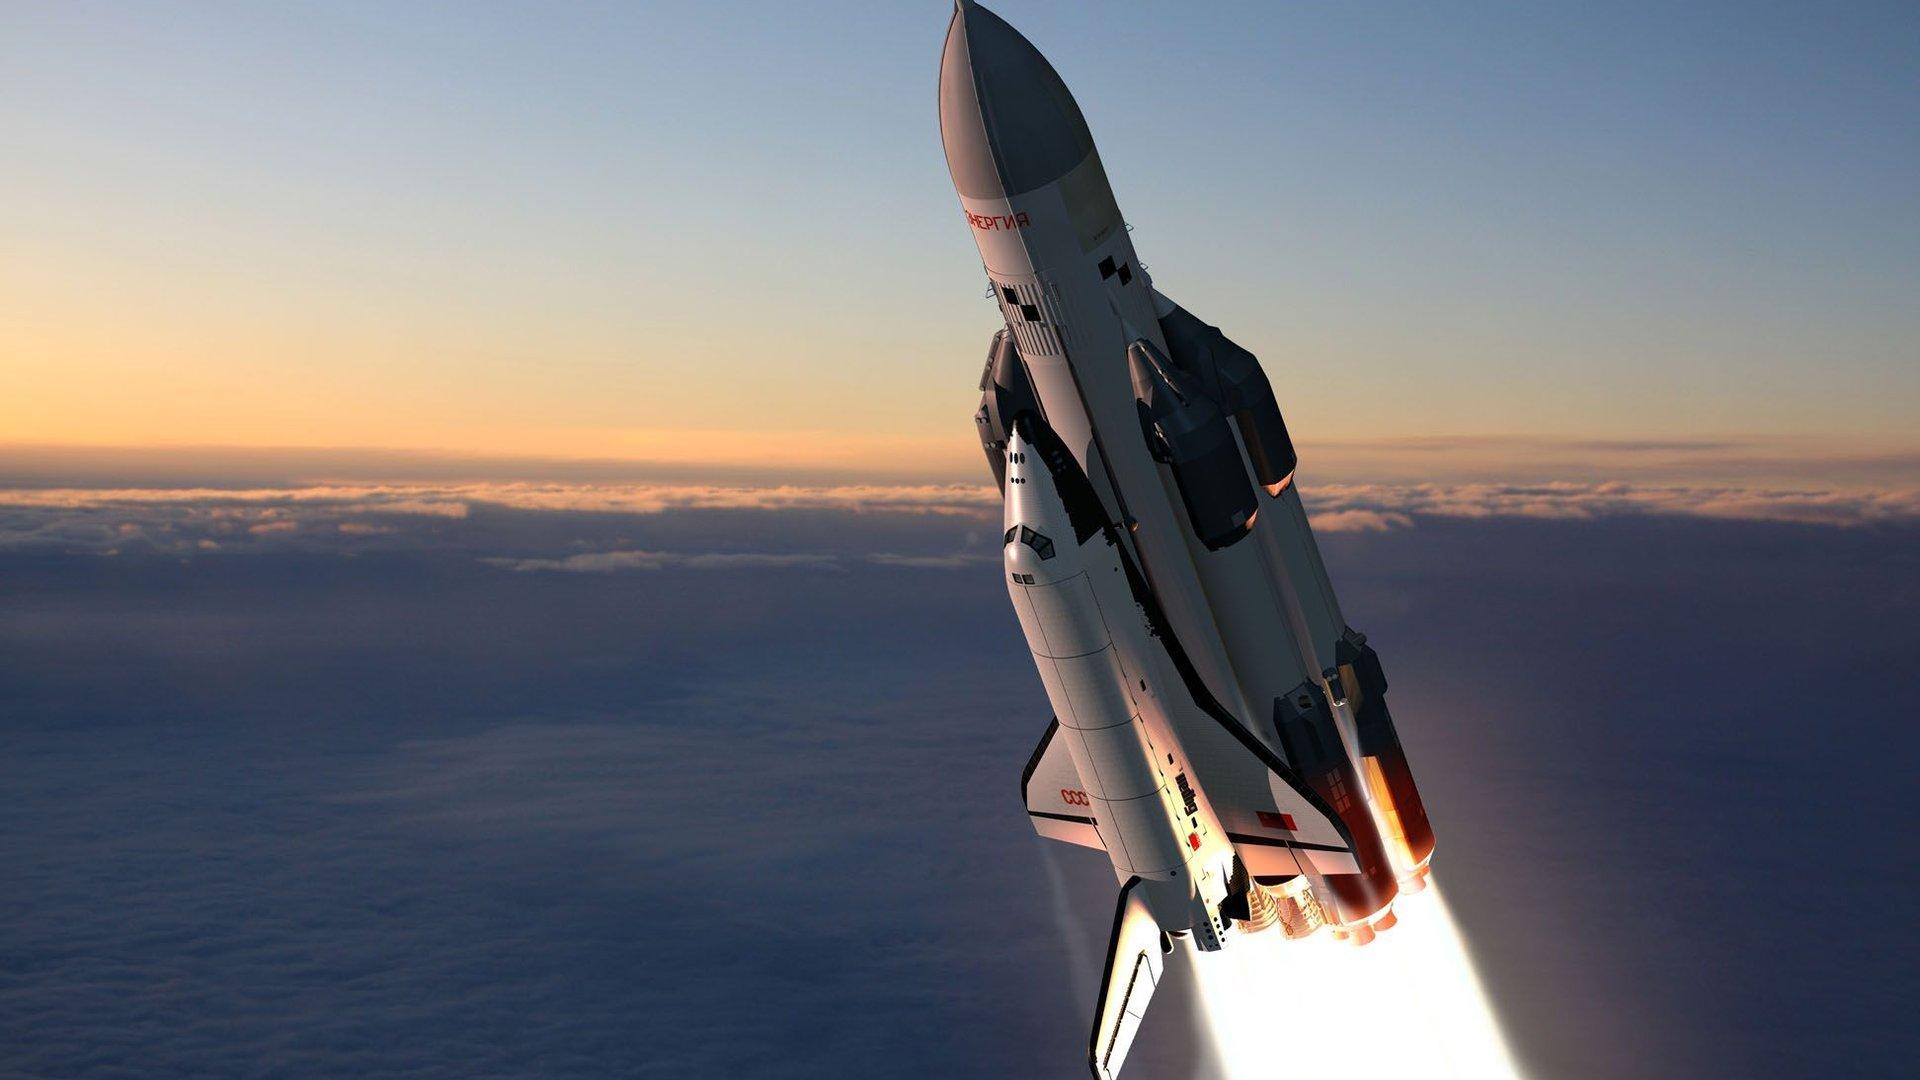 Space Shuttle Launch HD Wallpaper 1920x1080 ID14391 1920x1080